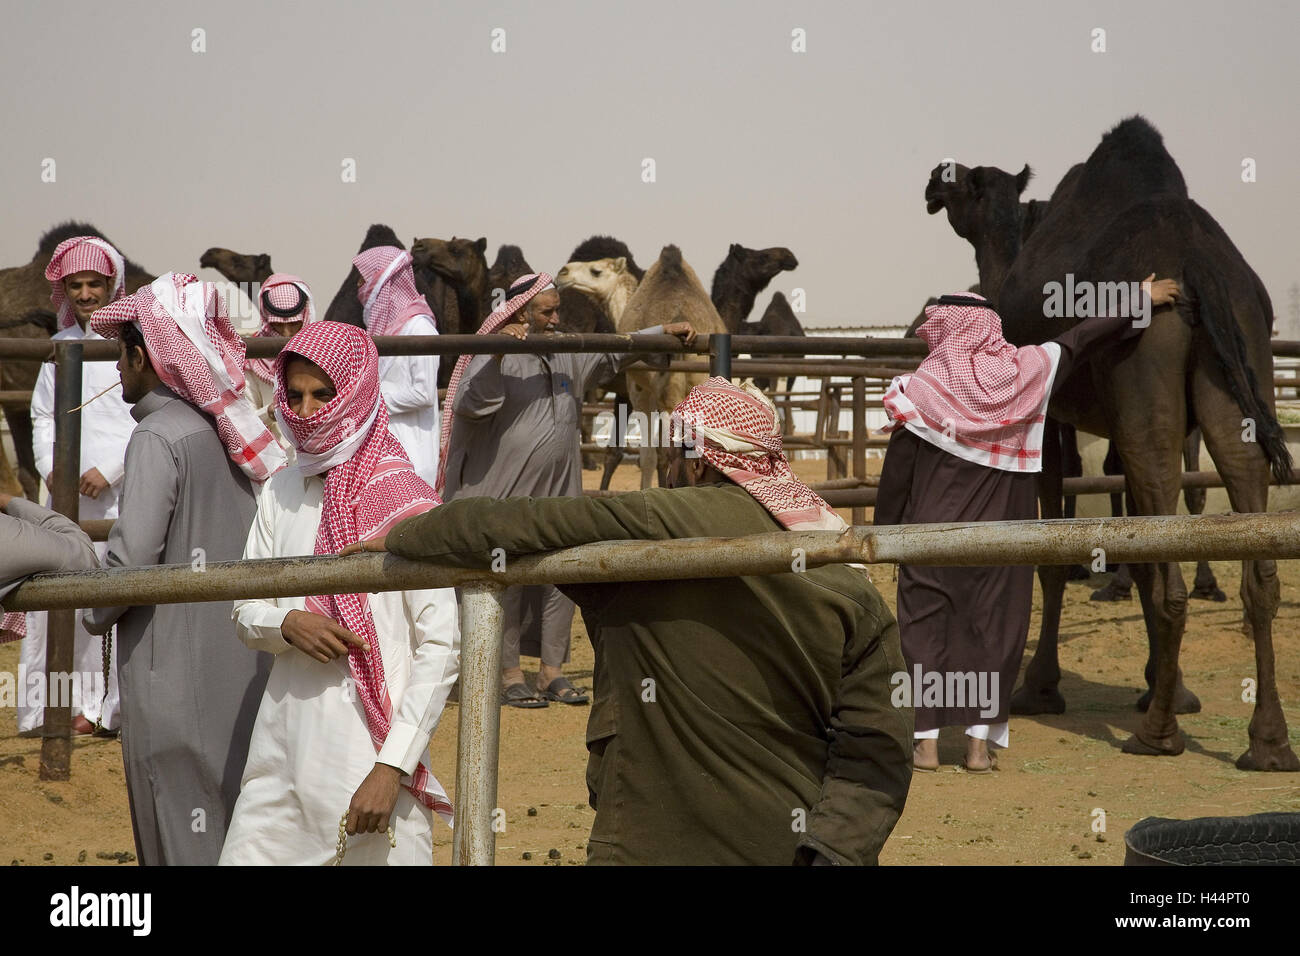 Arabia Saudita, provincia riad a Riad, mercato di cammelli, Immagini Stock